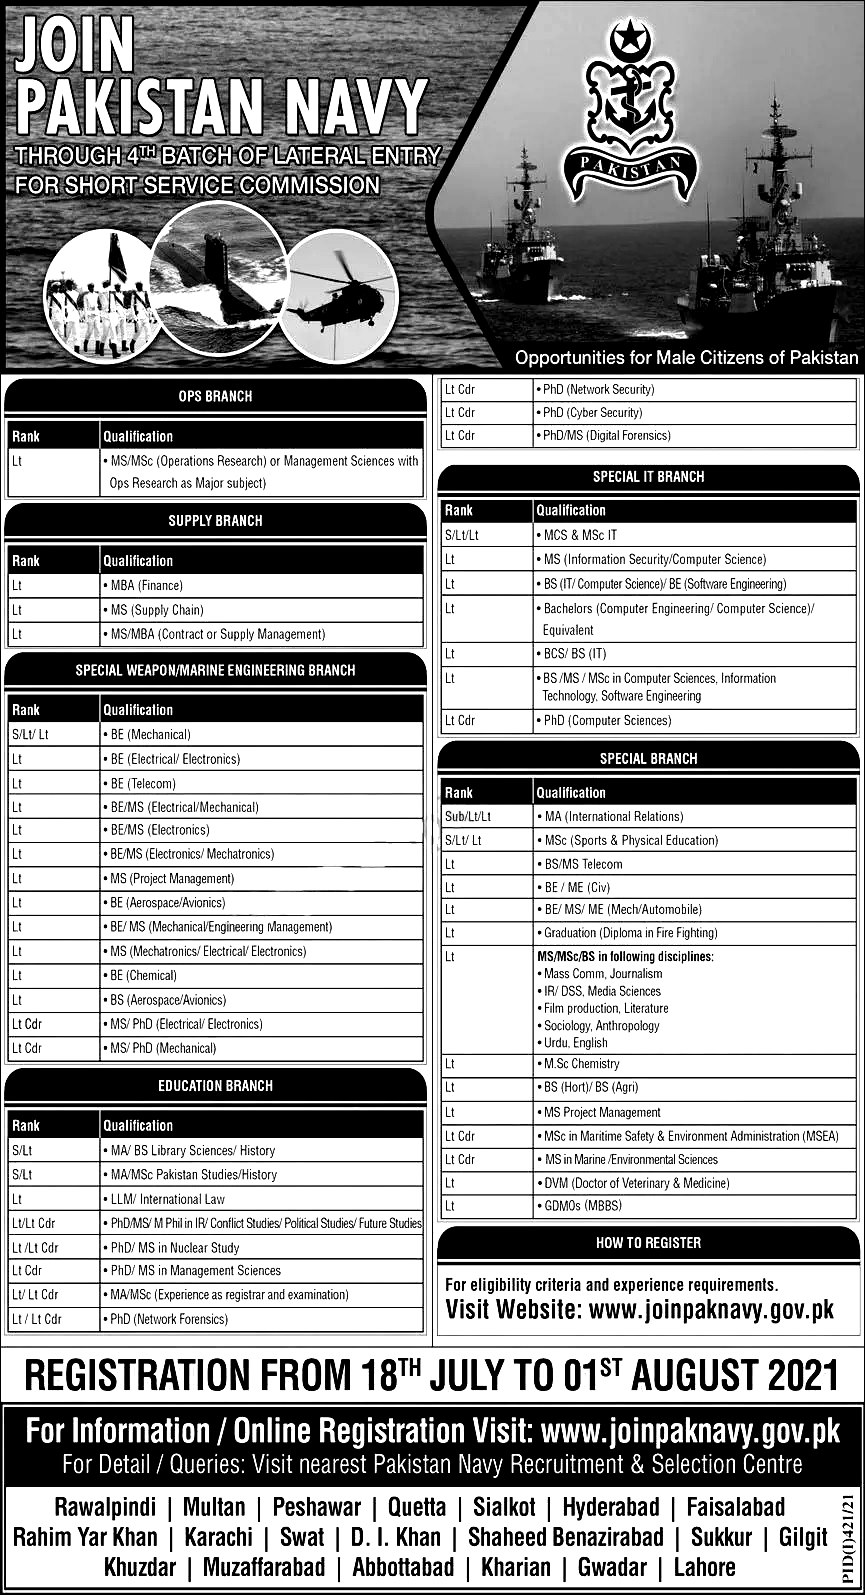 Join Pakistan Navy through Short Service Commission Course SSC 2021